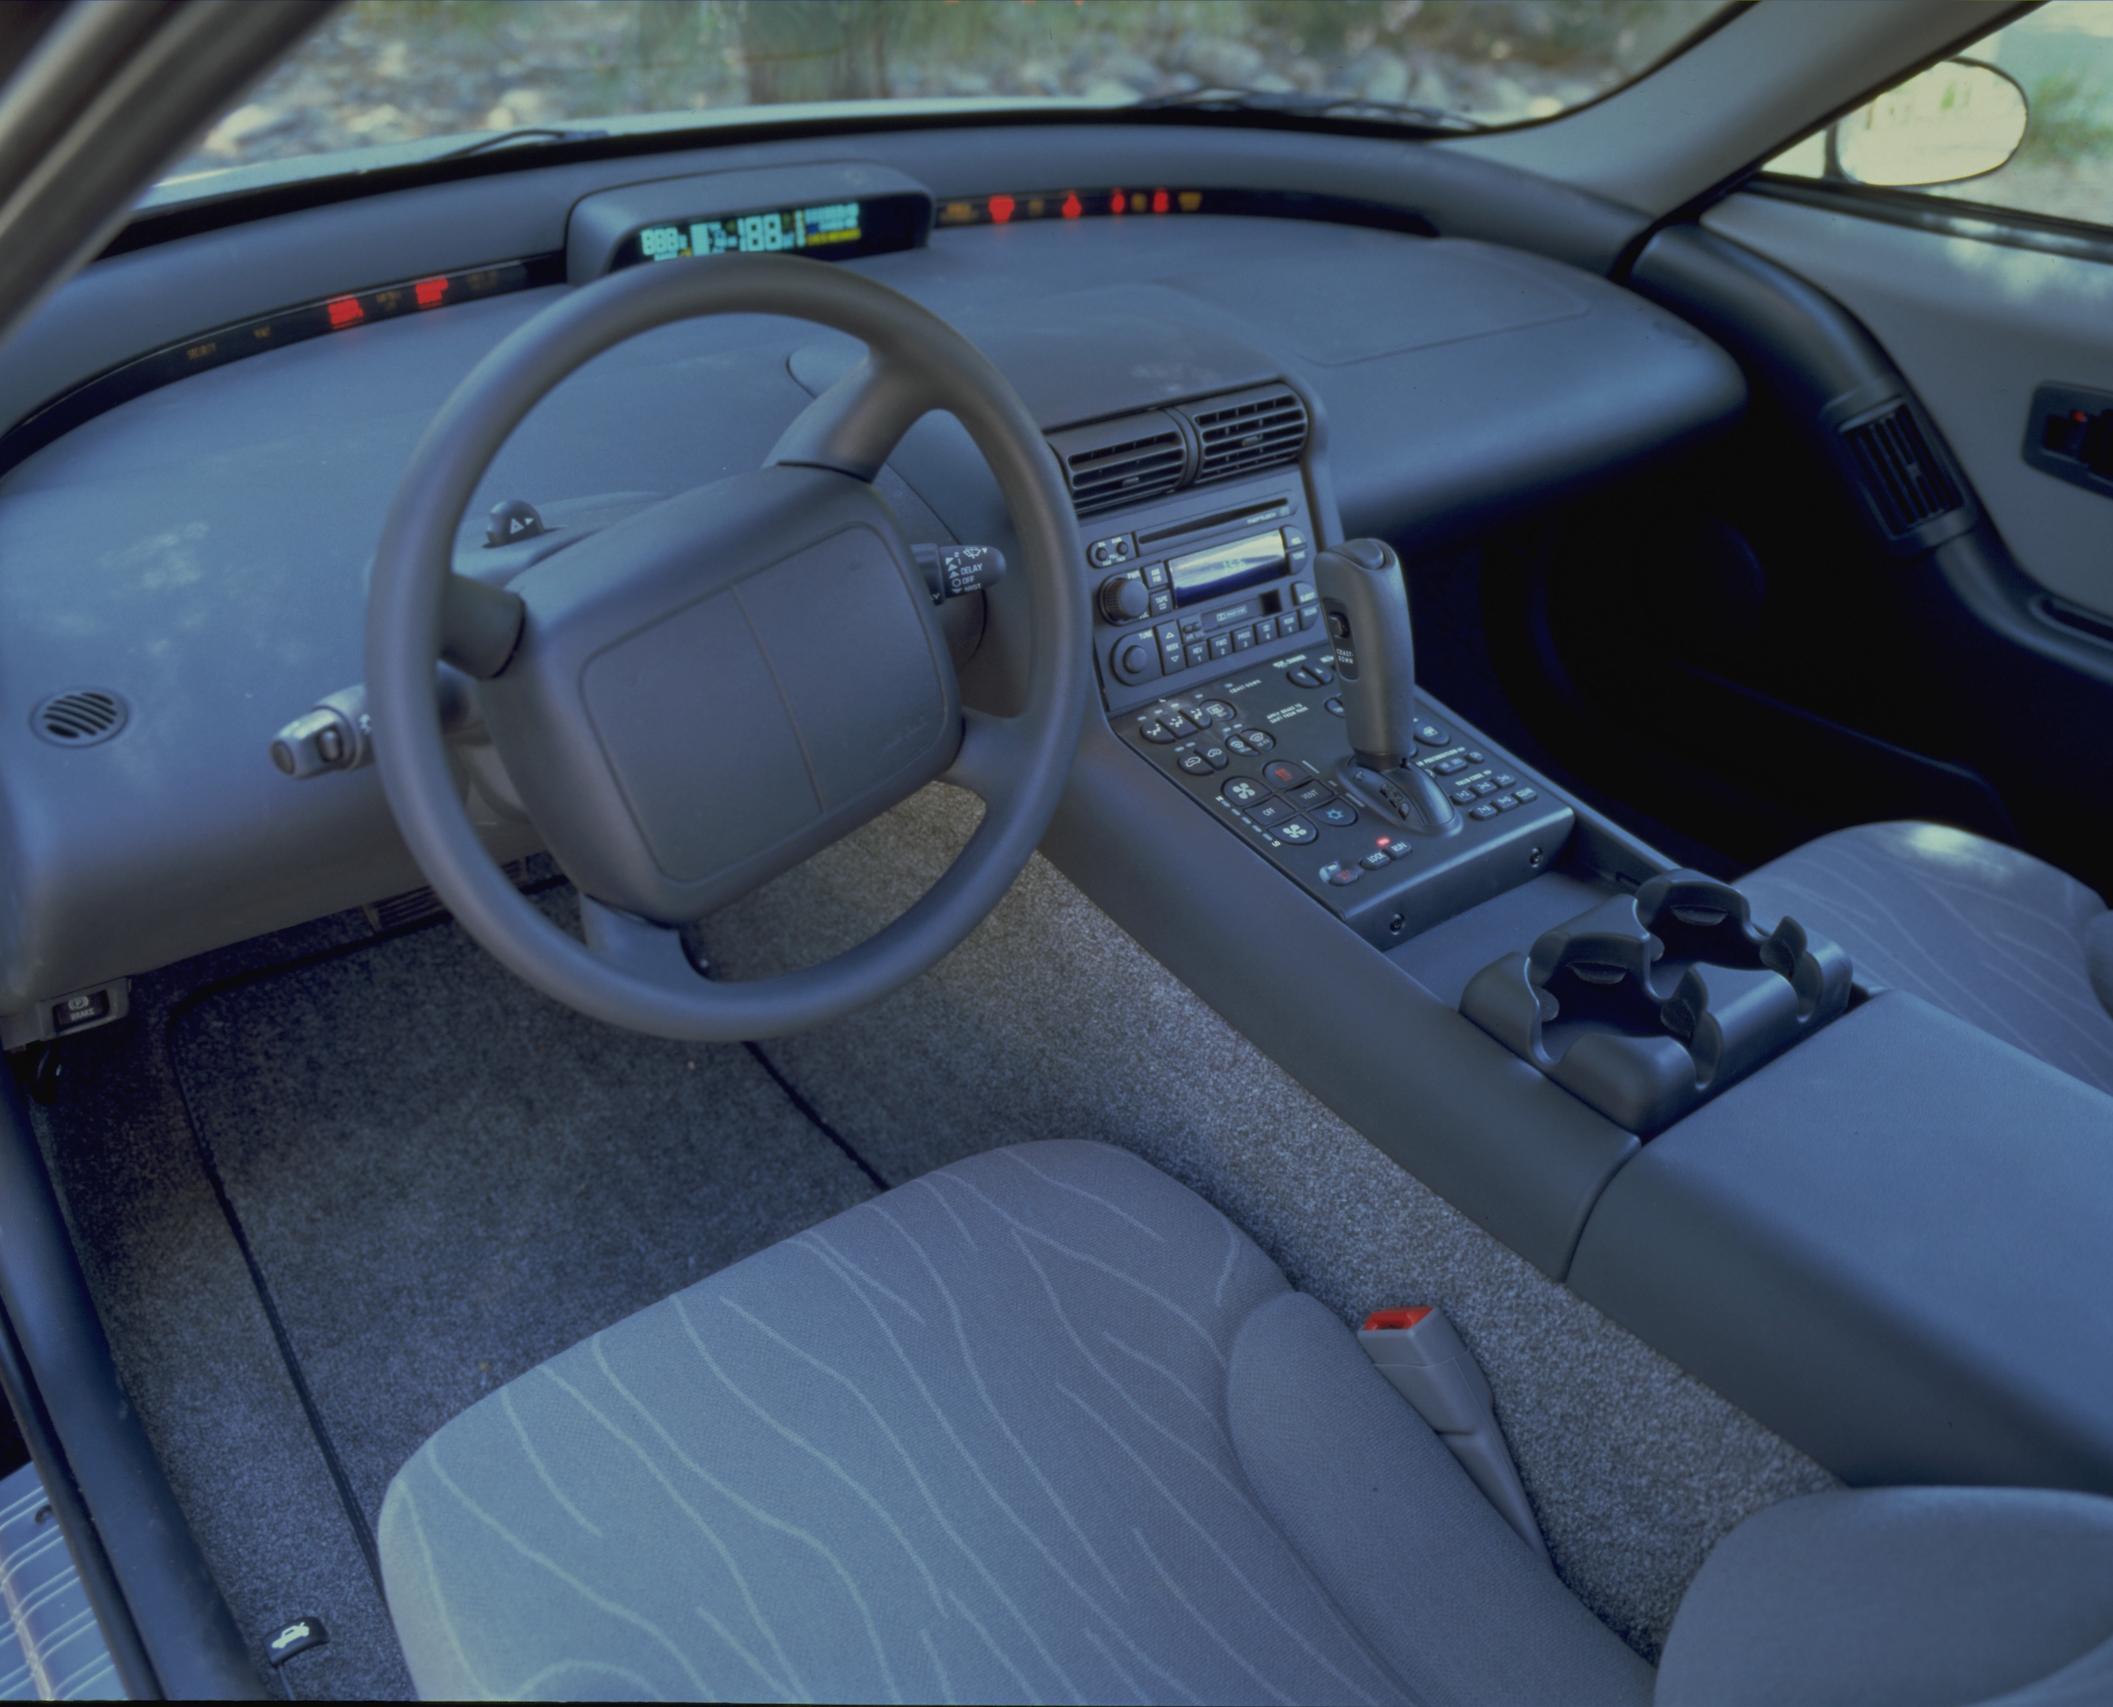 EV1 early GM electric car interior